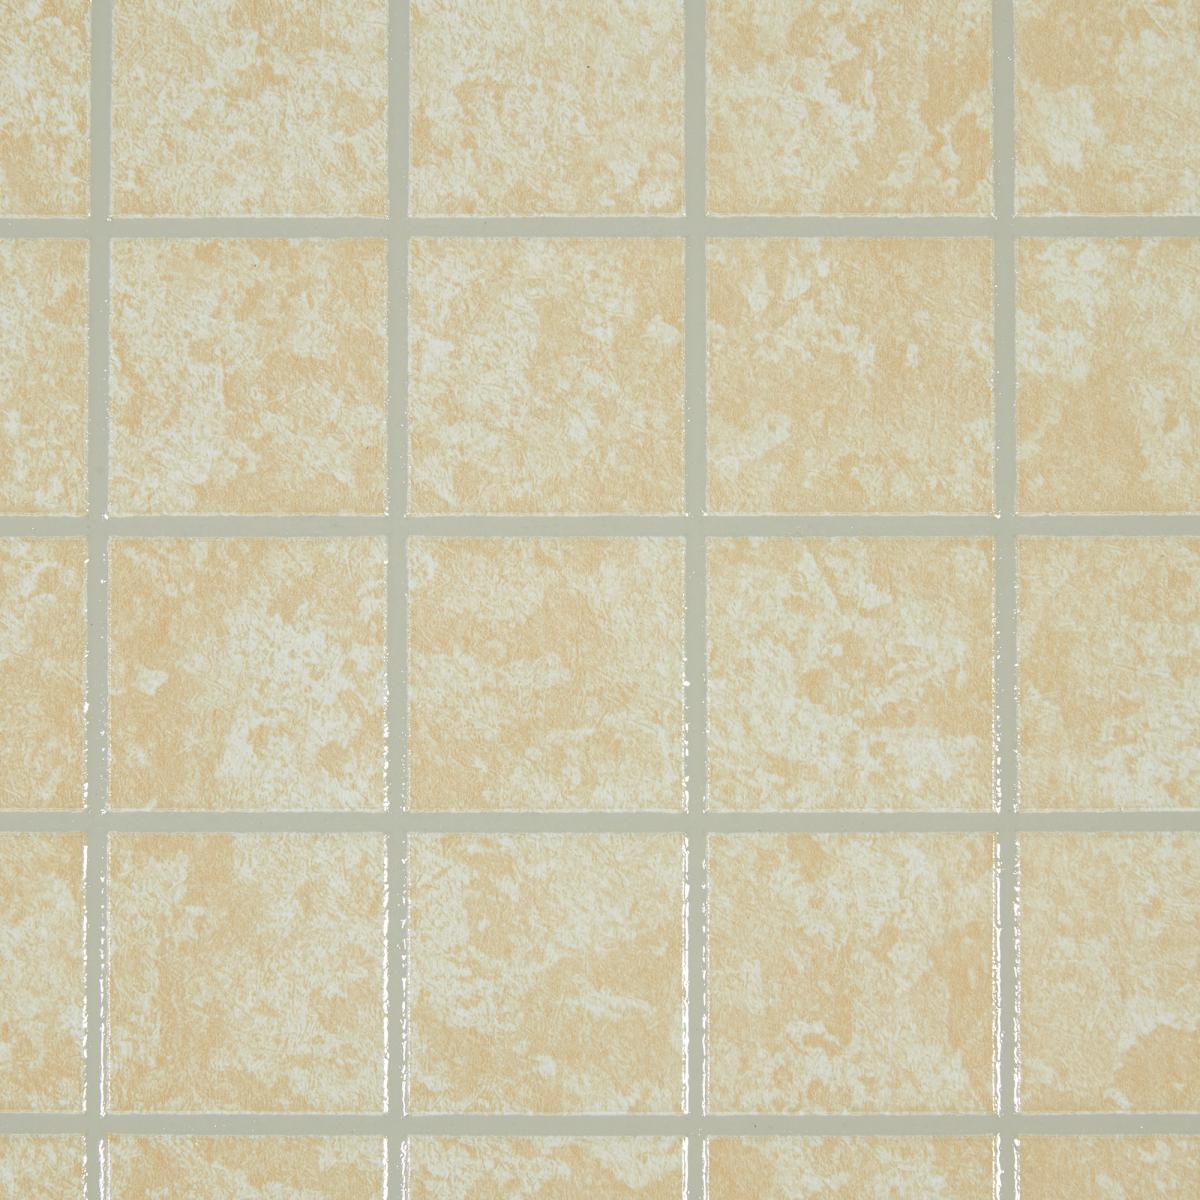 Панель МДФ Песчанный мрамор 2440x1220 мм 2.98 м2